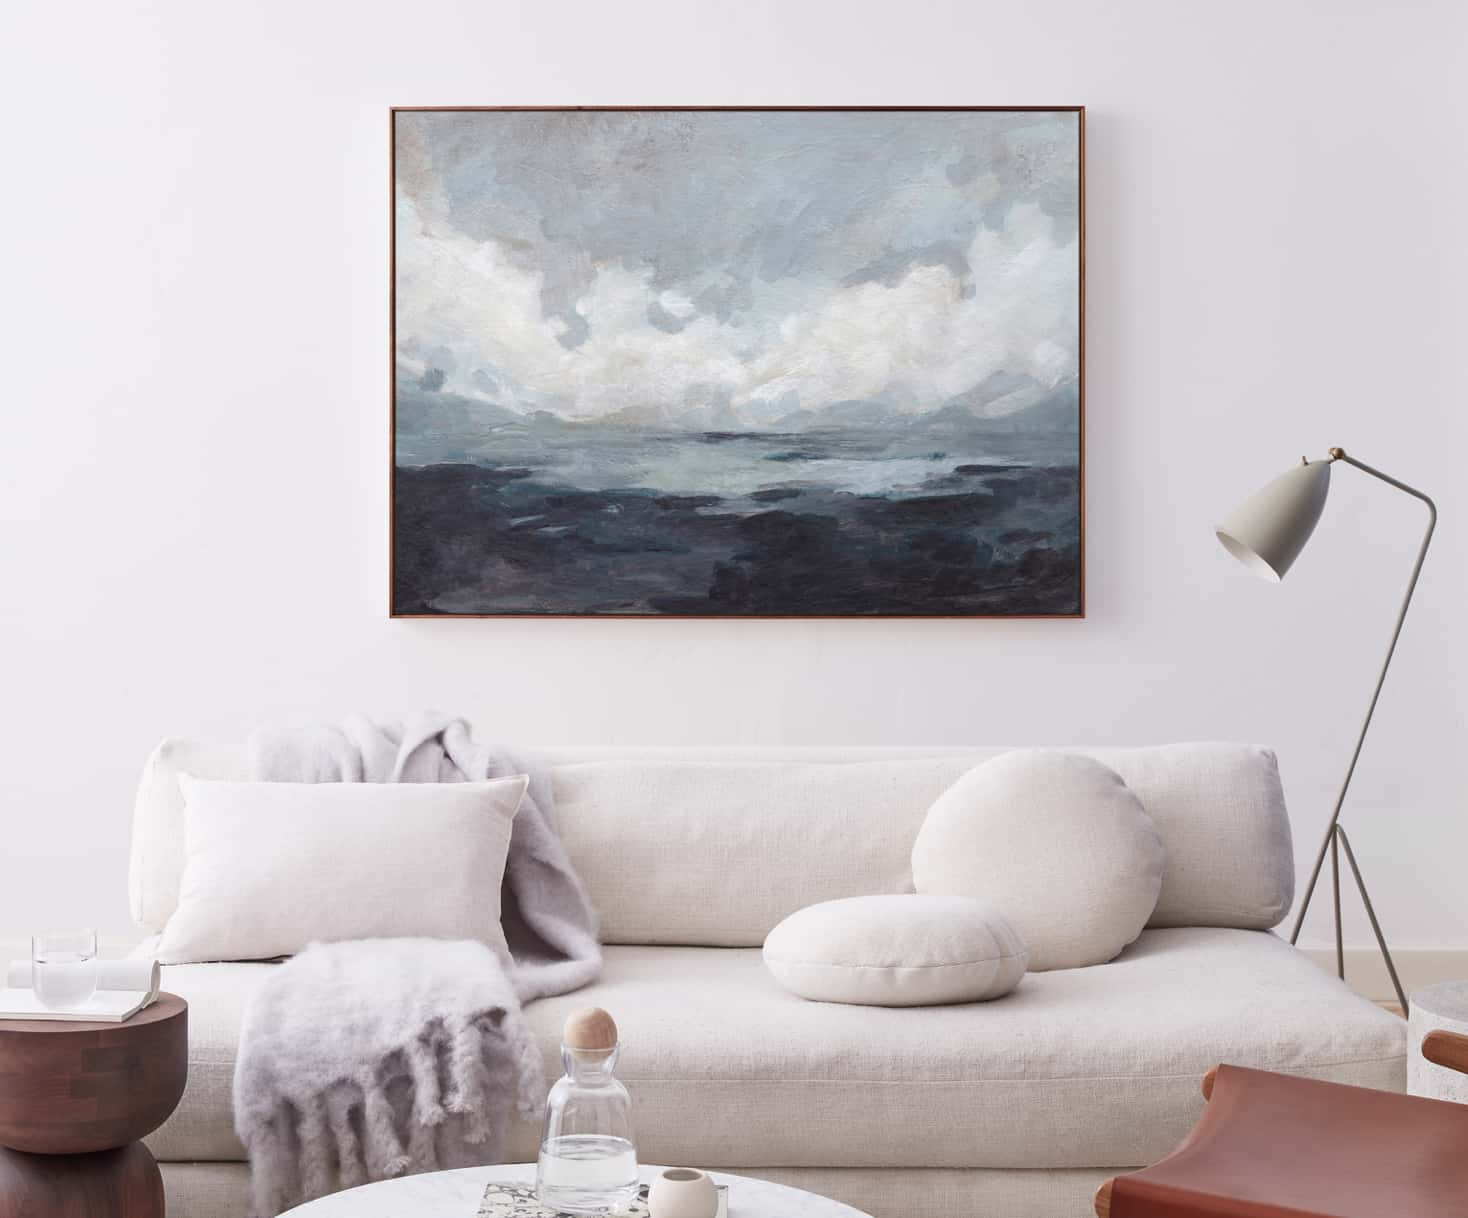 Canvas art on a wall